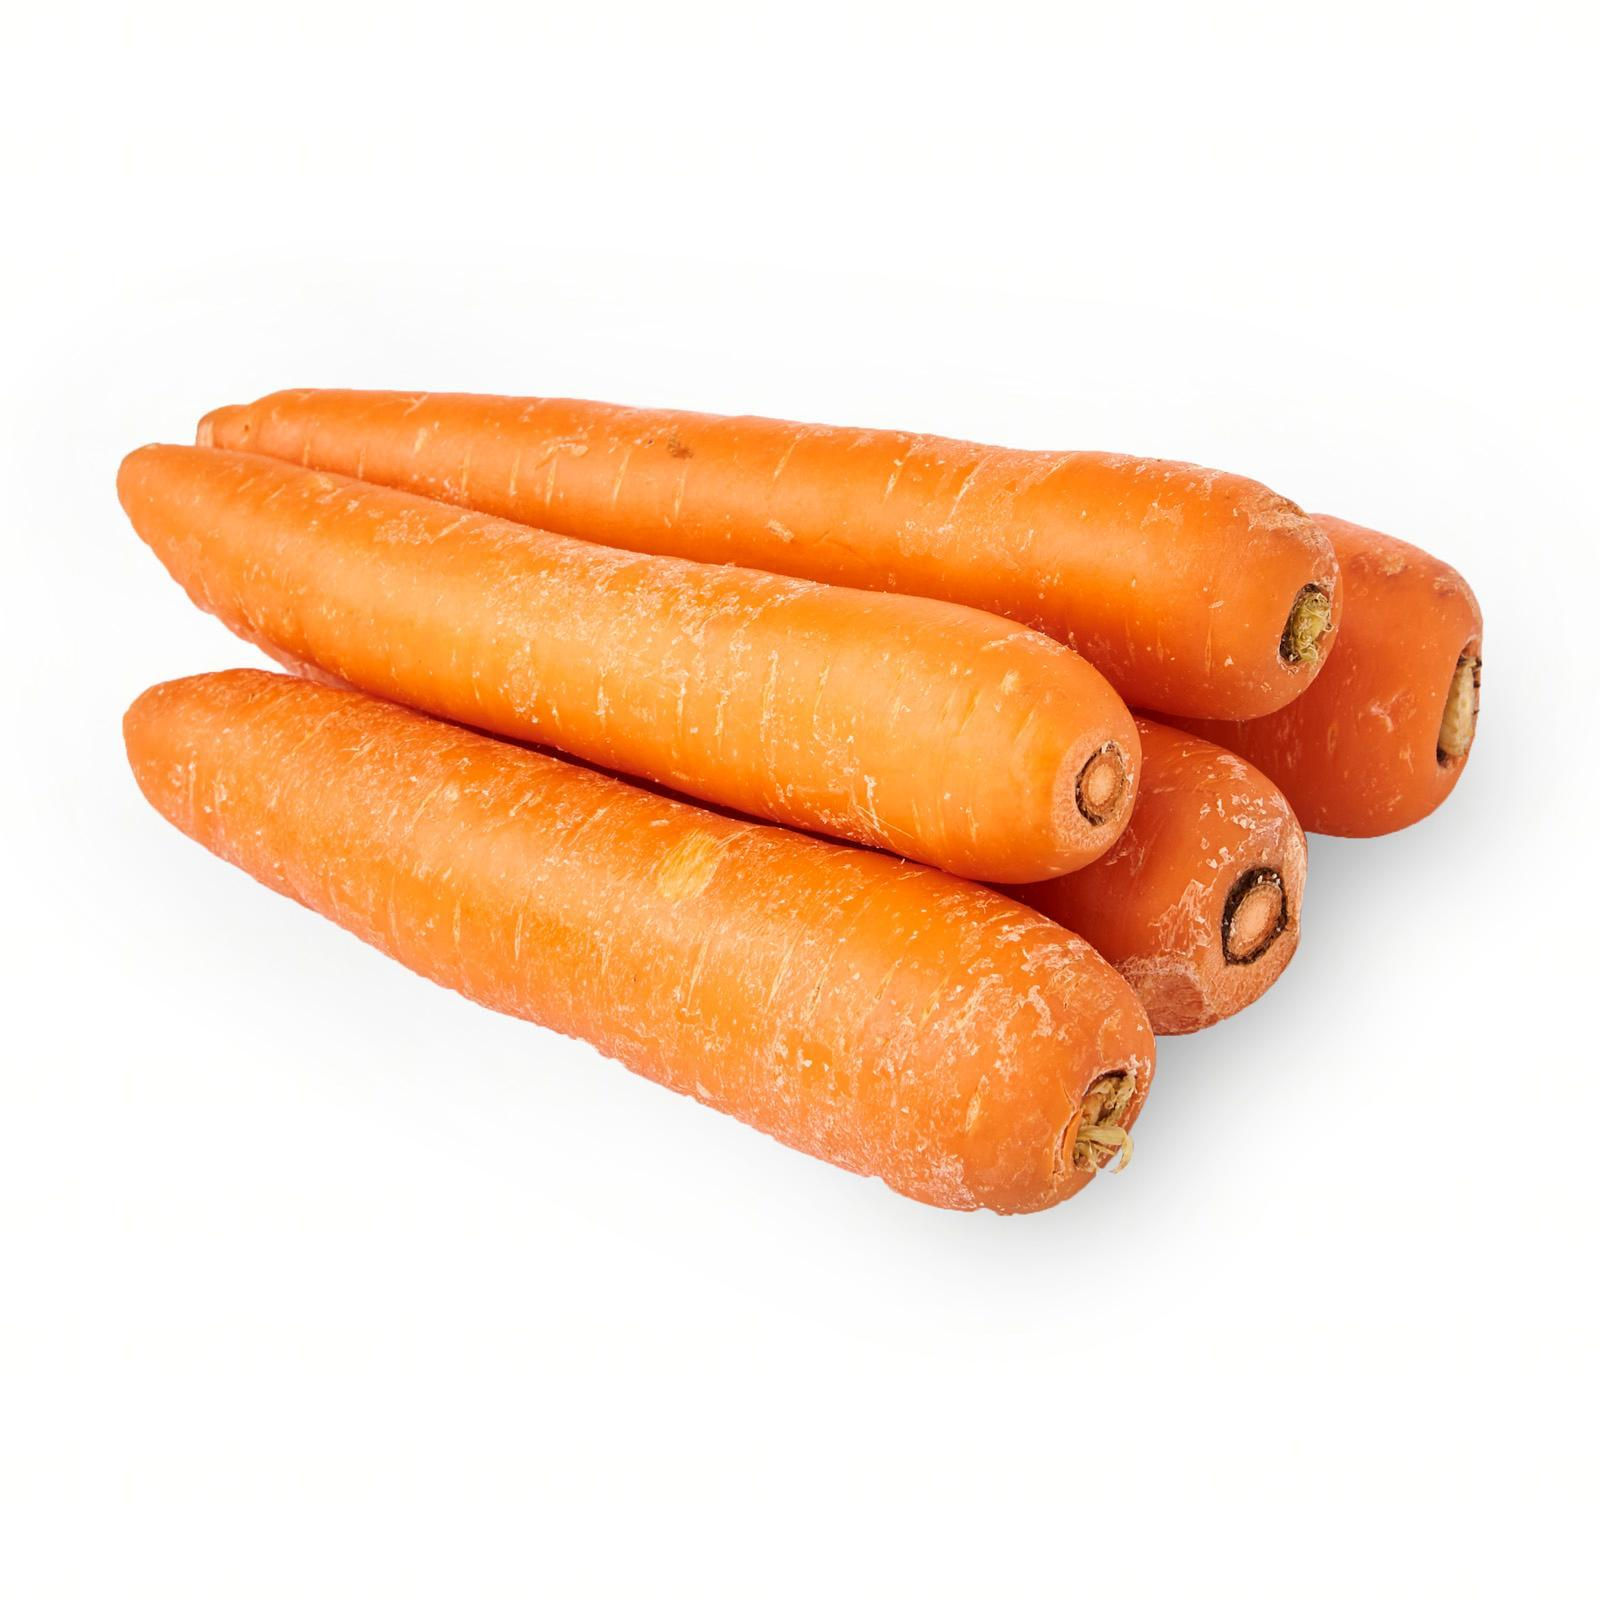 Organic 4 Life Organic Carrots